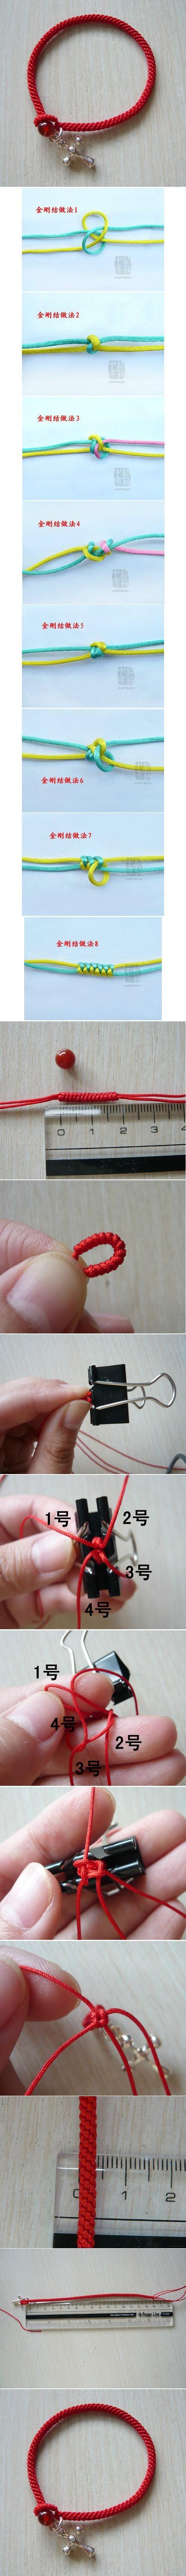 DIY Easy Chinese Knot Bracelet